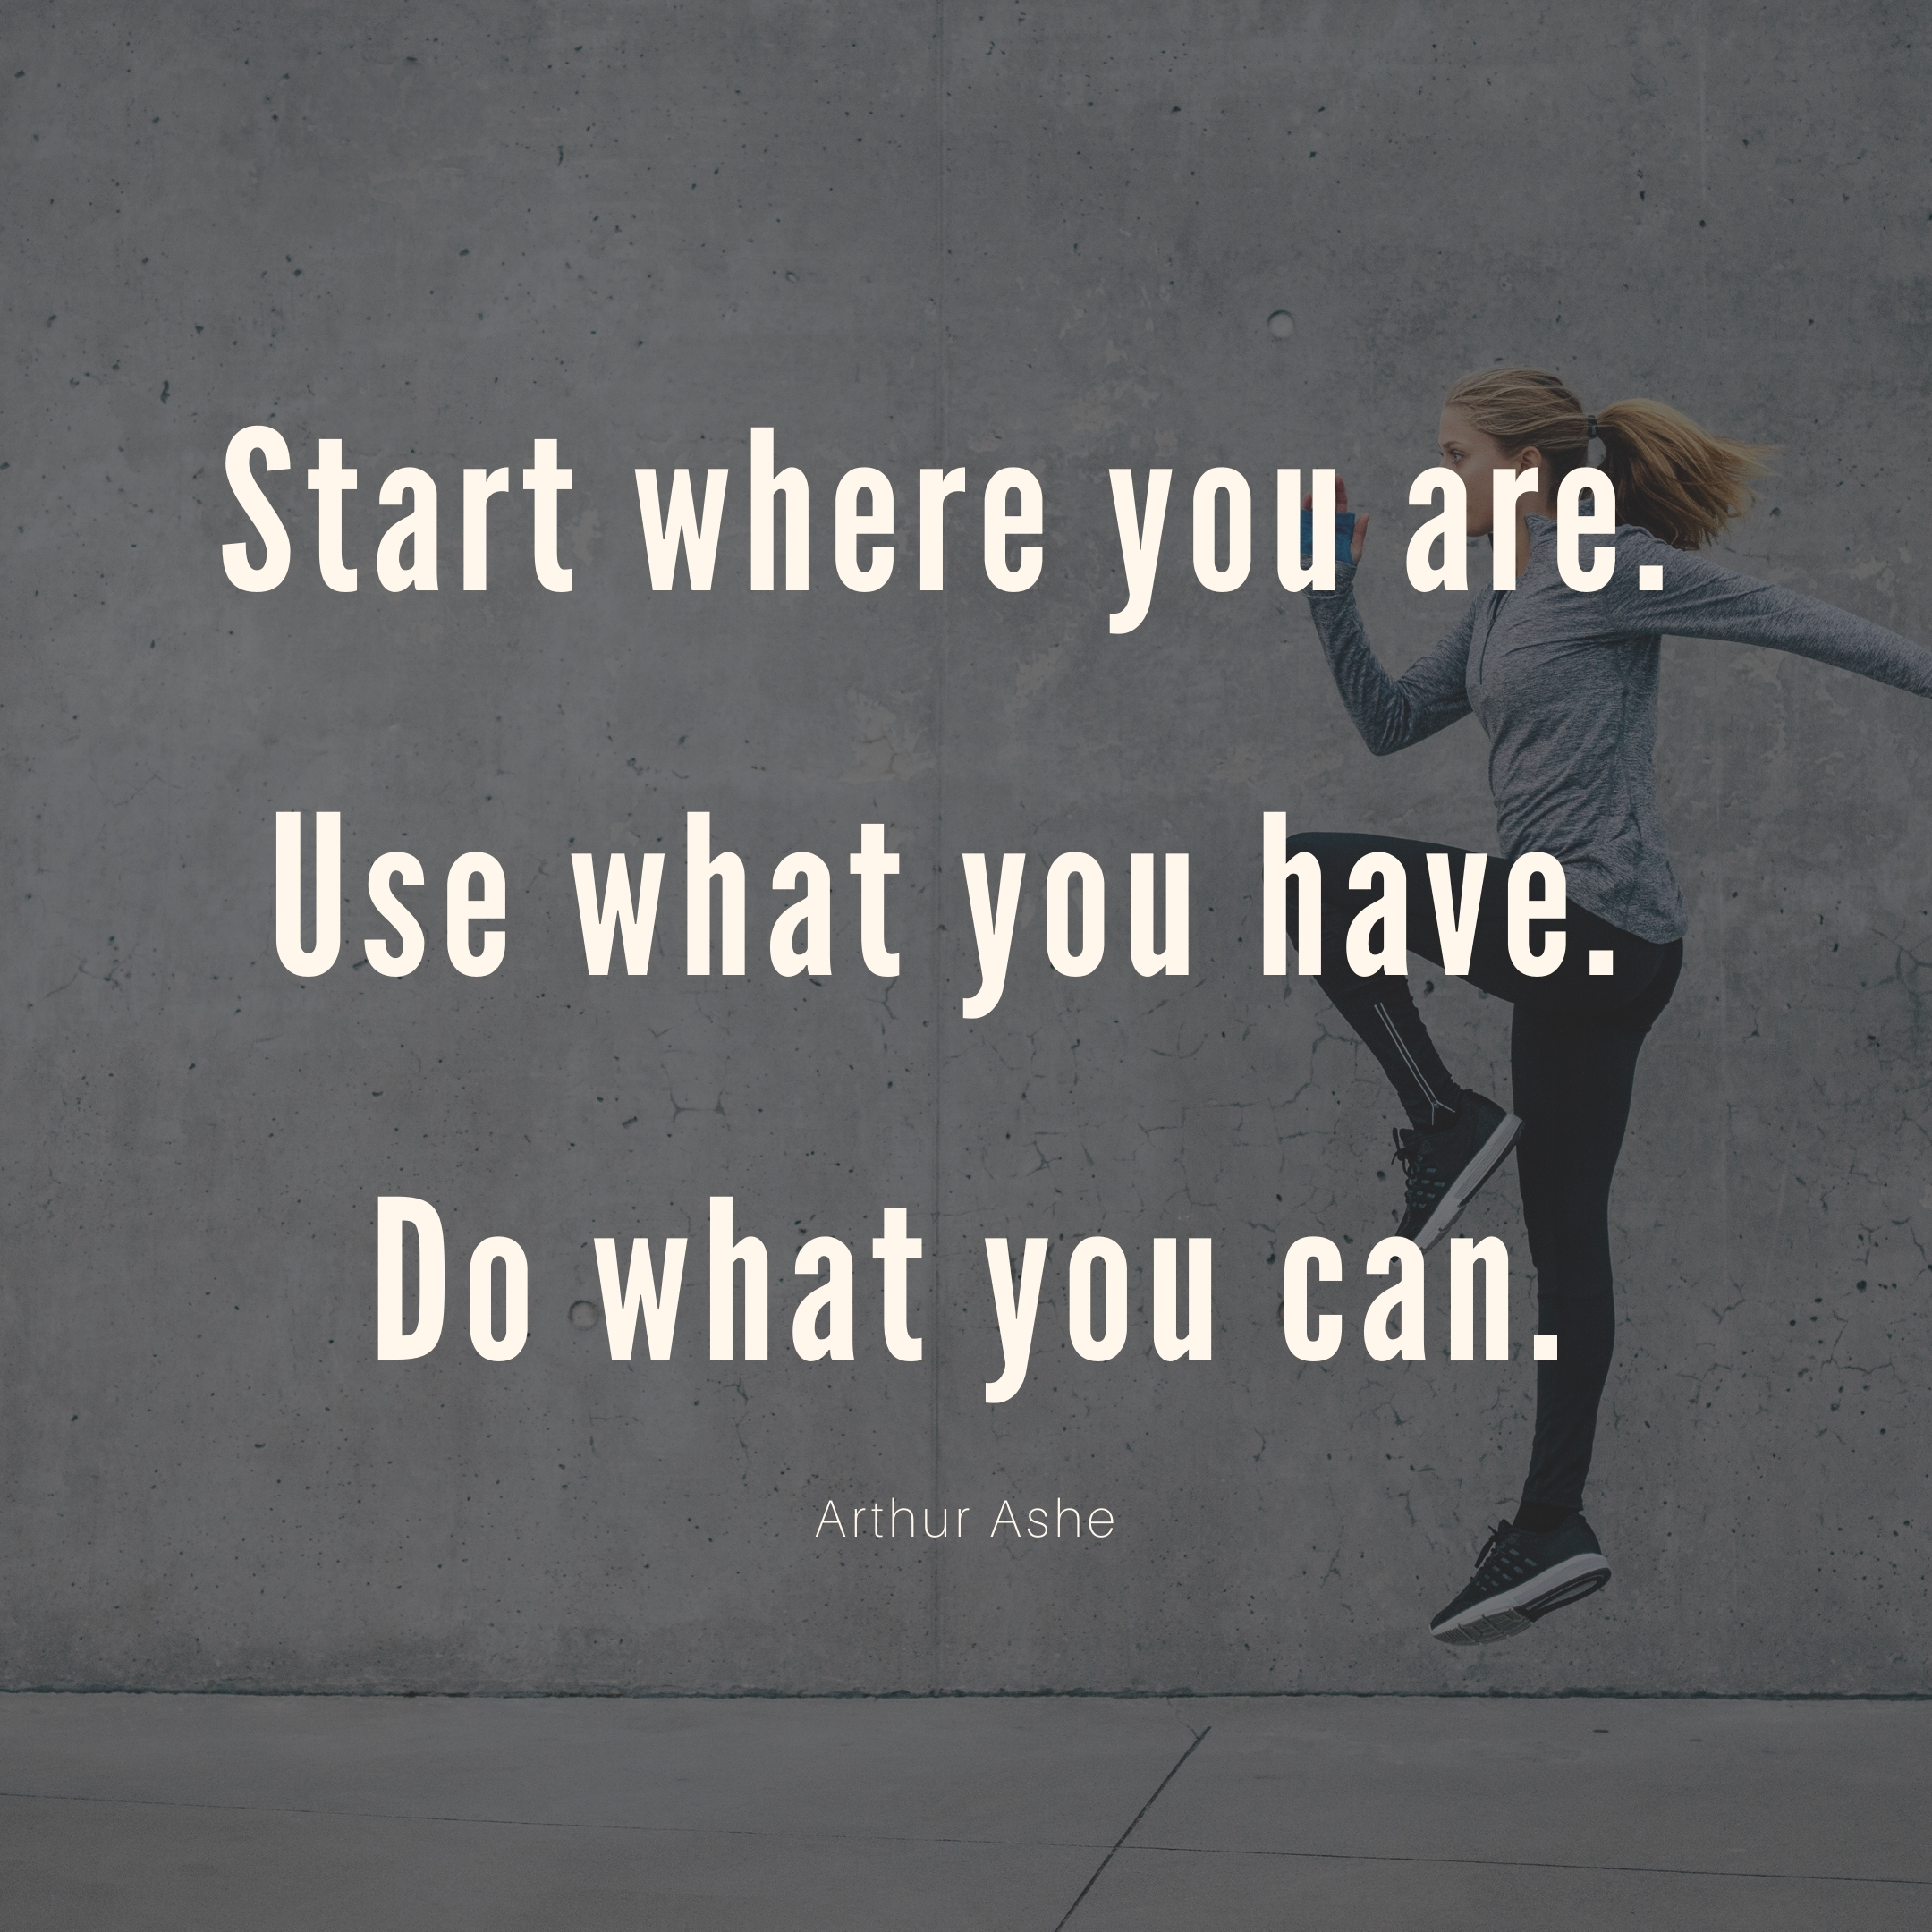 arthur ashe quote | monday motivation quotes